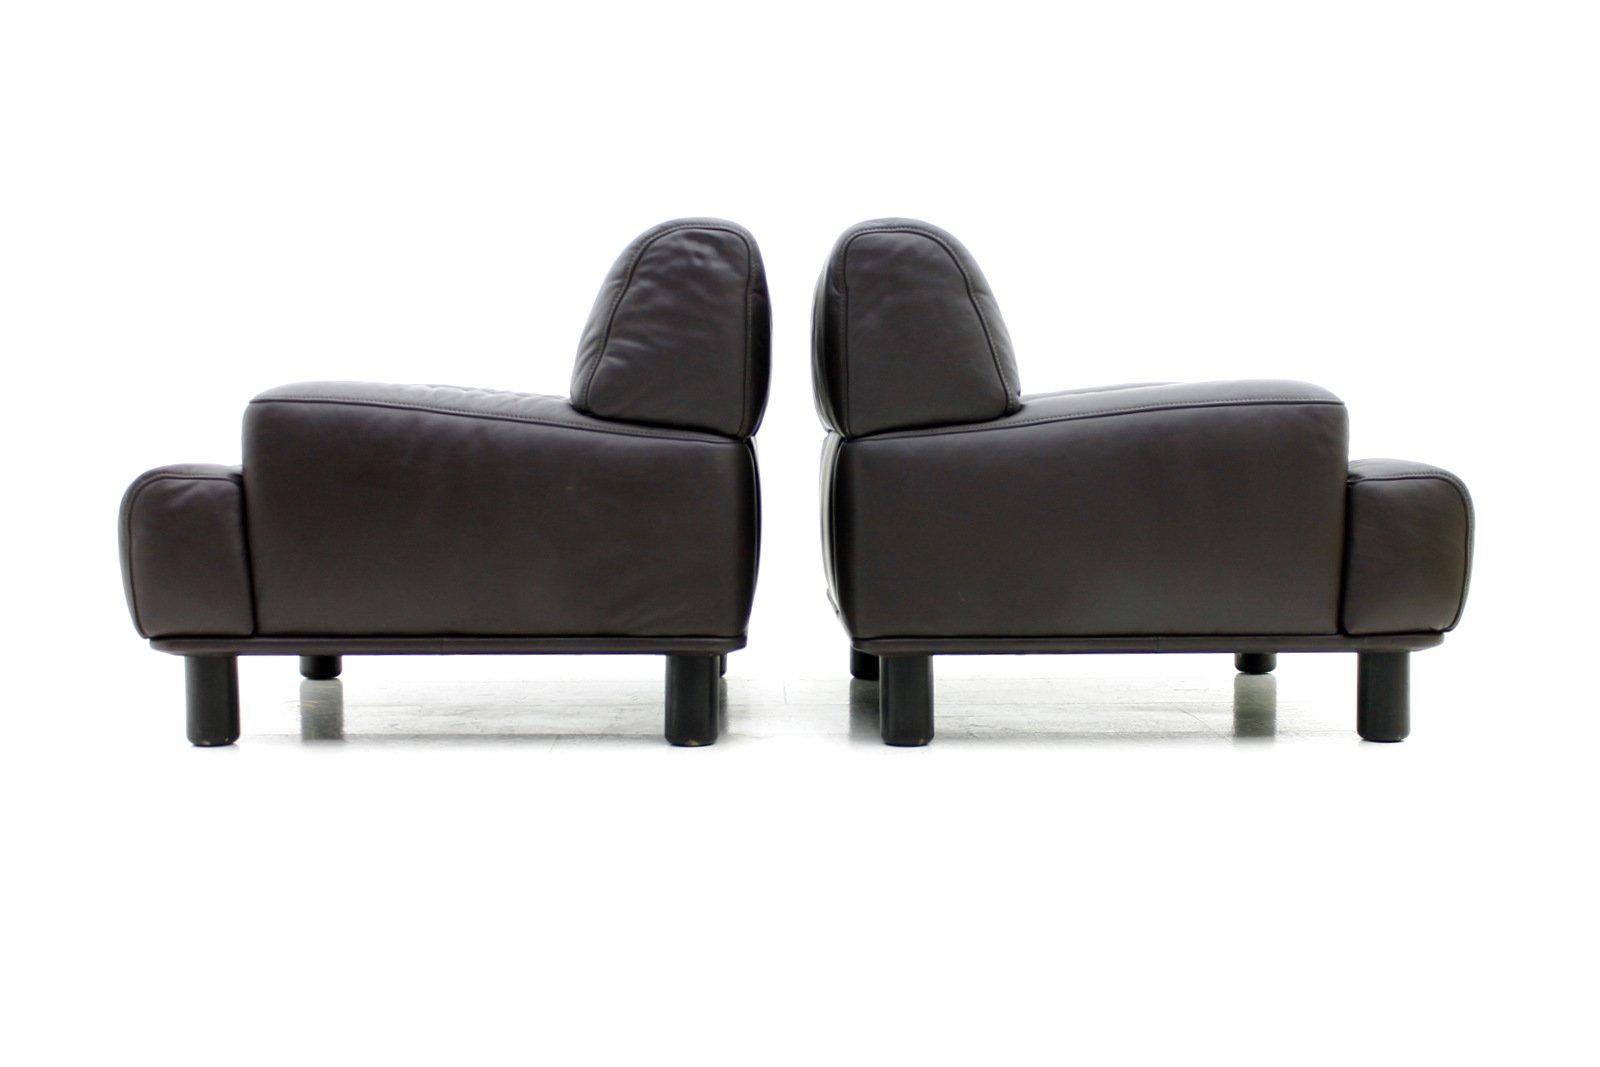 schweizerische vintage leder lounge sessel von de sede bei. Black Bedroom Furniture Sets. Home Design Ideas